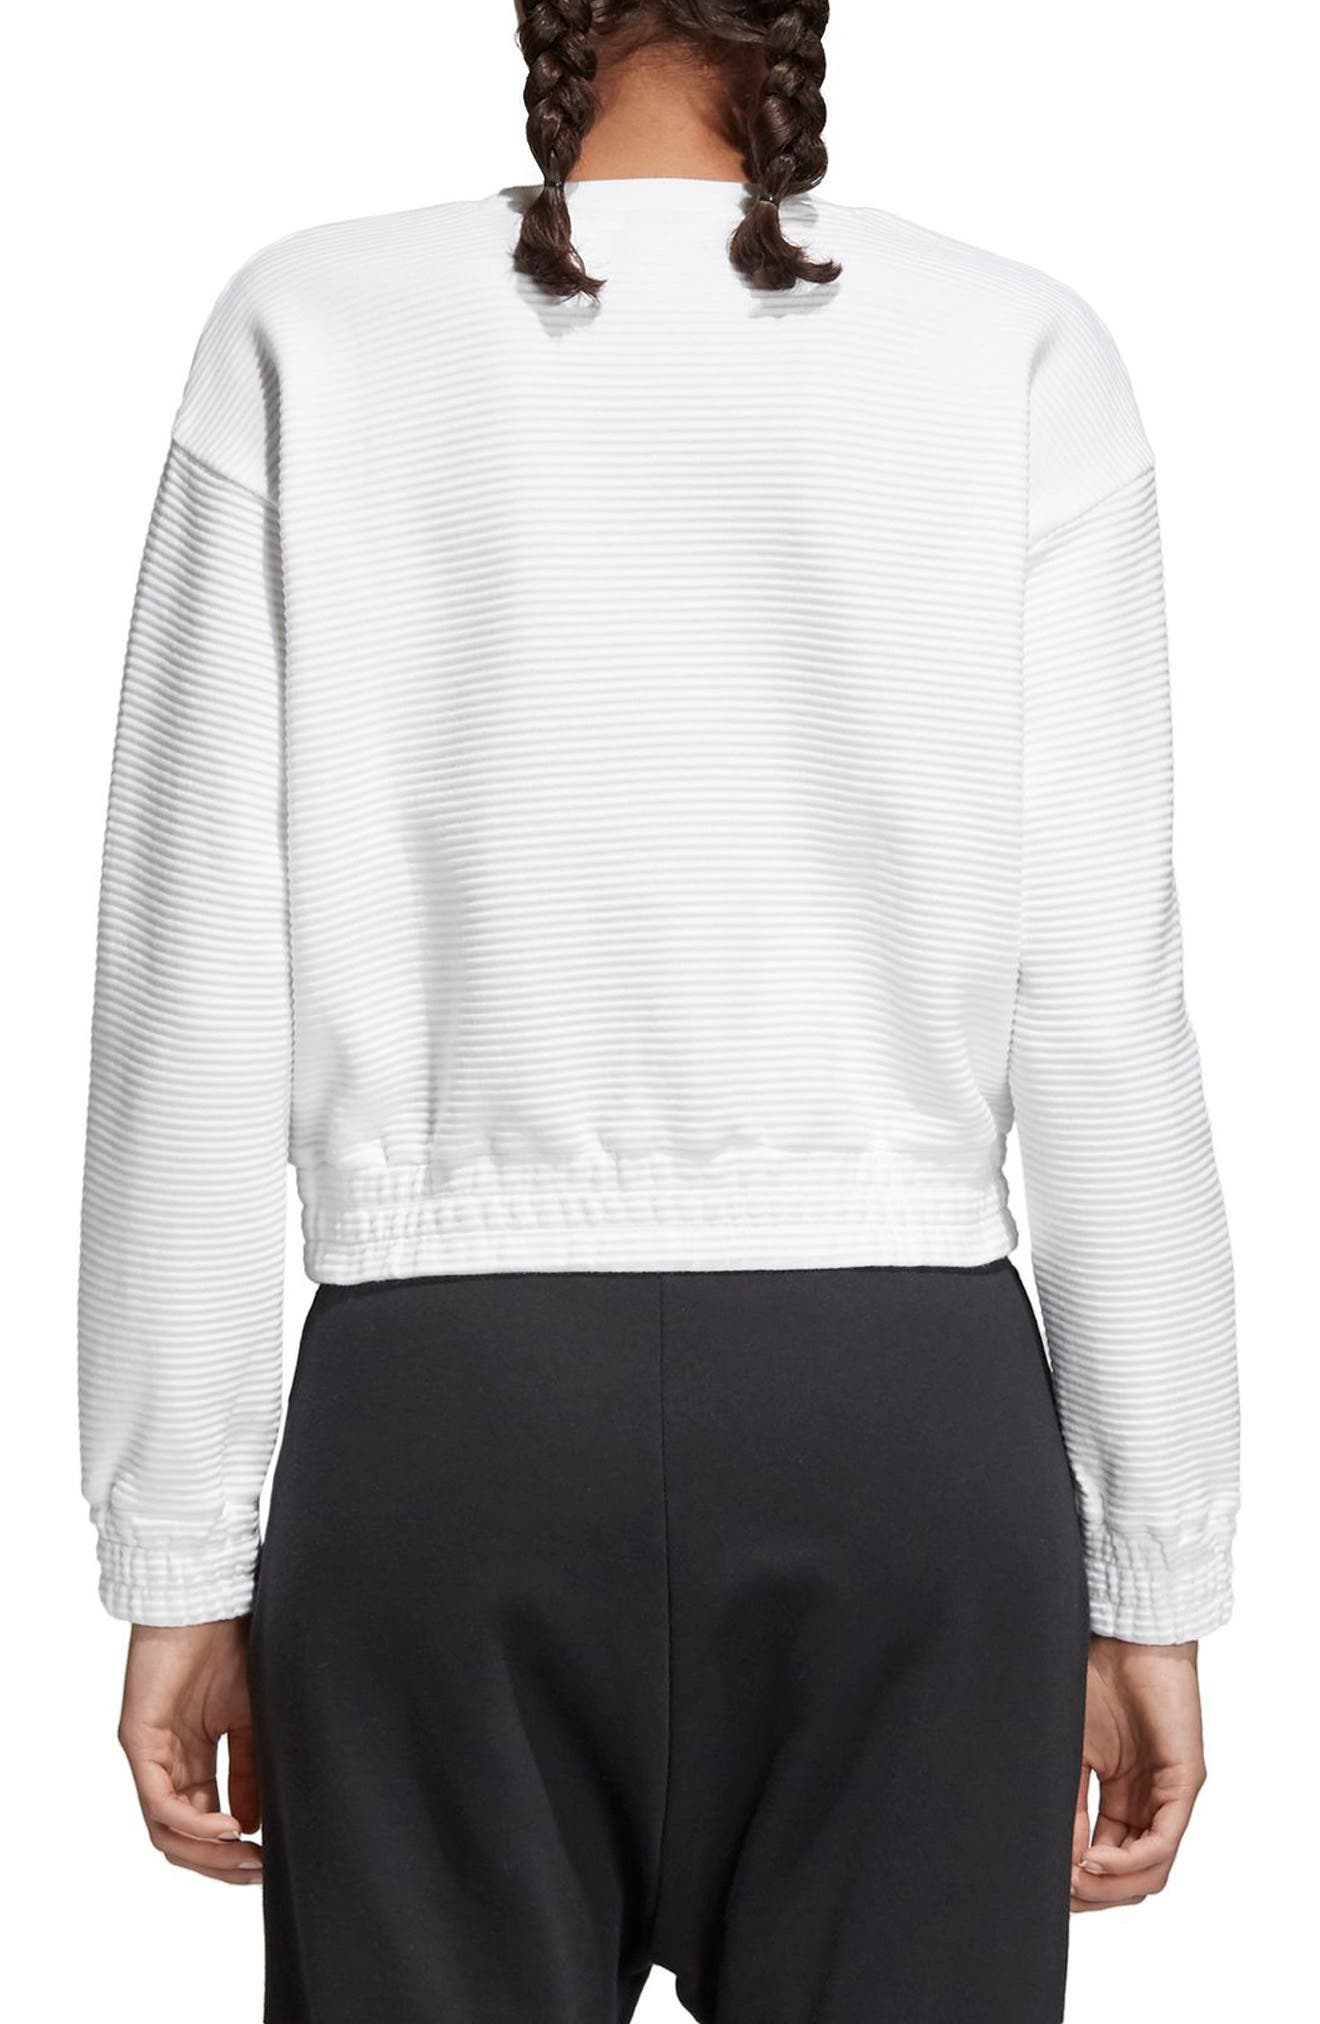 EQT Sweatshirt,                             Alternate thumbnail 2, color,                             100